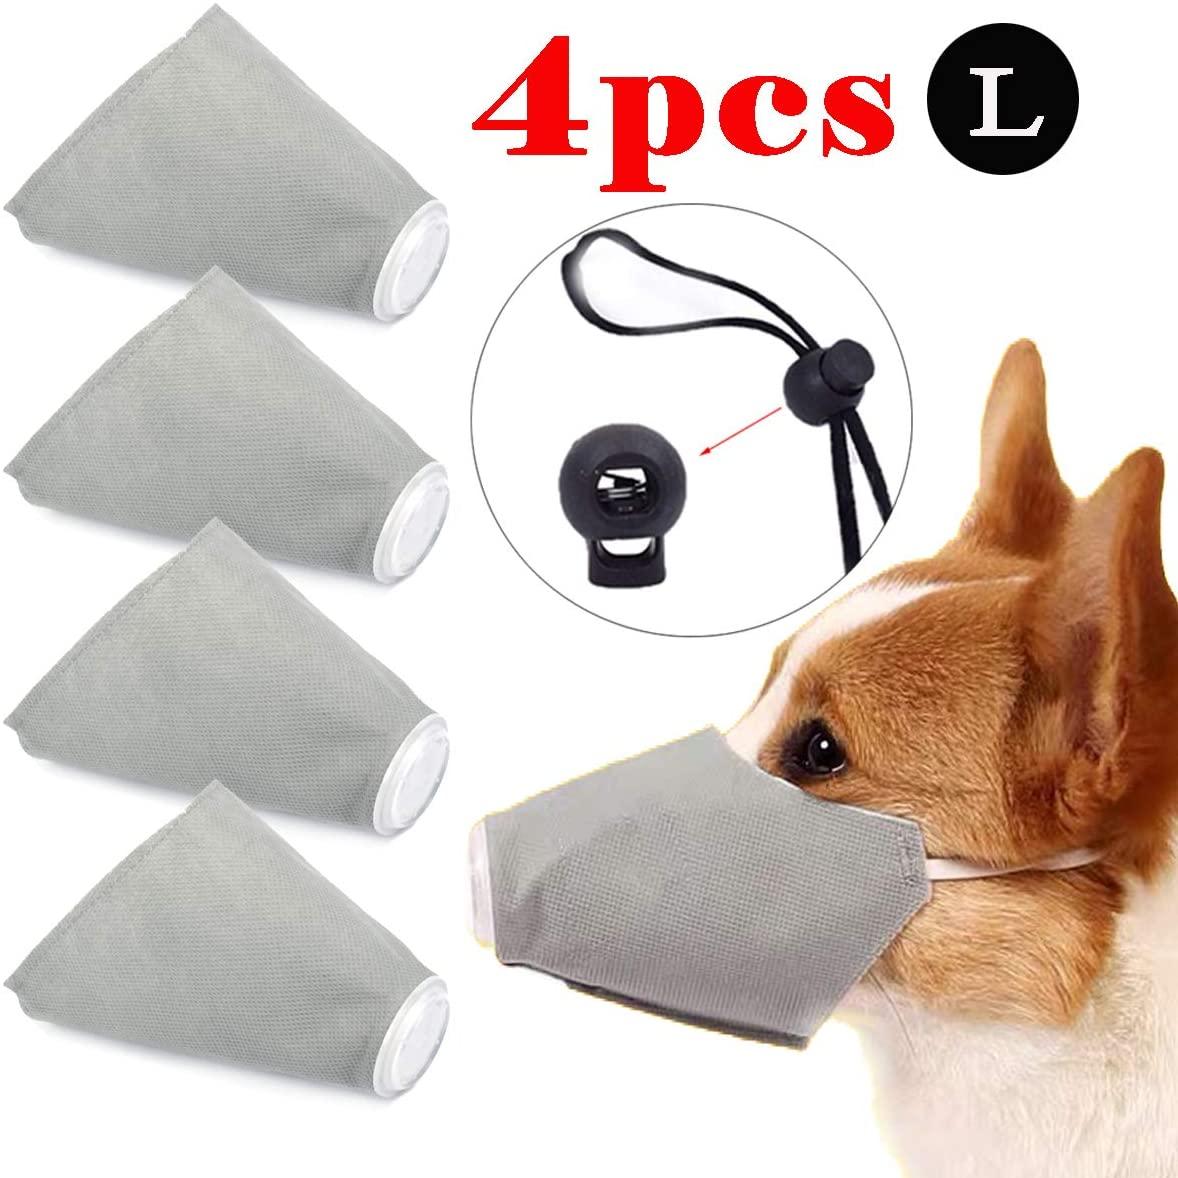 LKGEGO Dog Respirator Muzzle, Dog Protective Muzzle Breathable Pet Respirator Muzzle Adjustable Protective Muzzle for Small to Large Dogs (4 PCS)